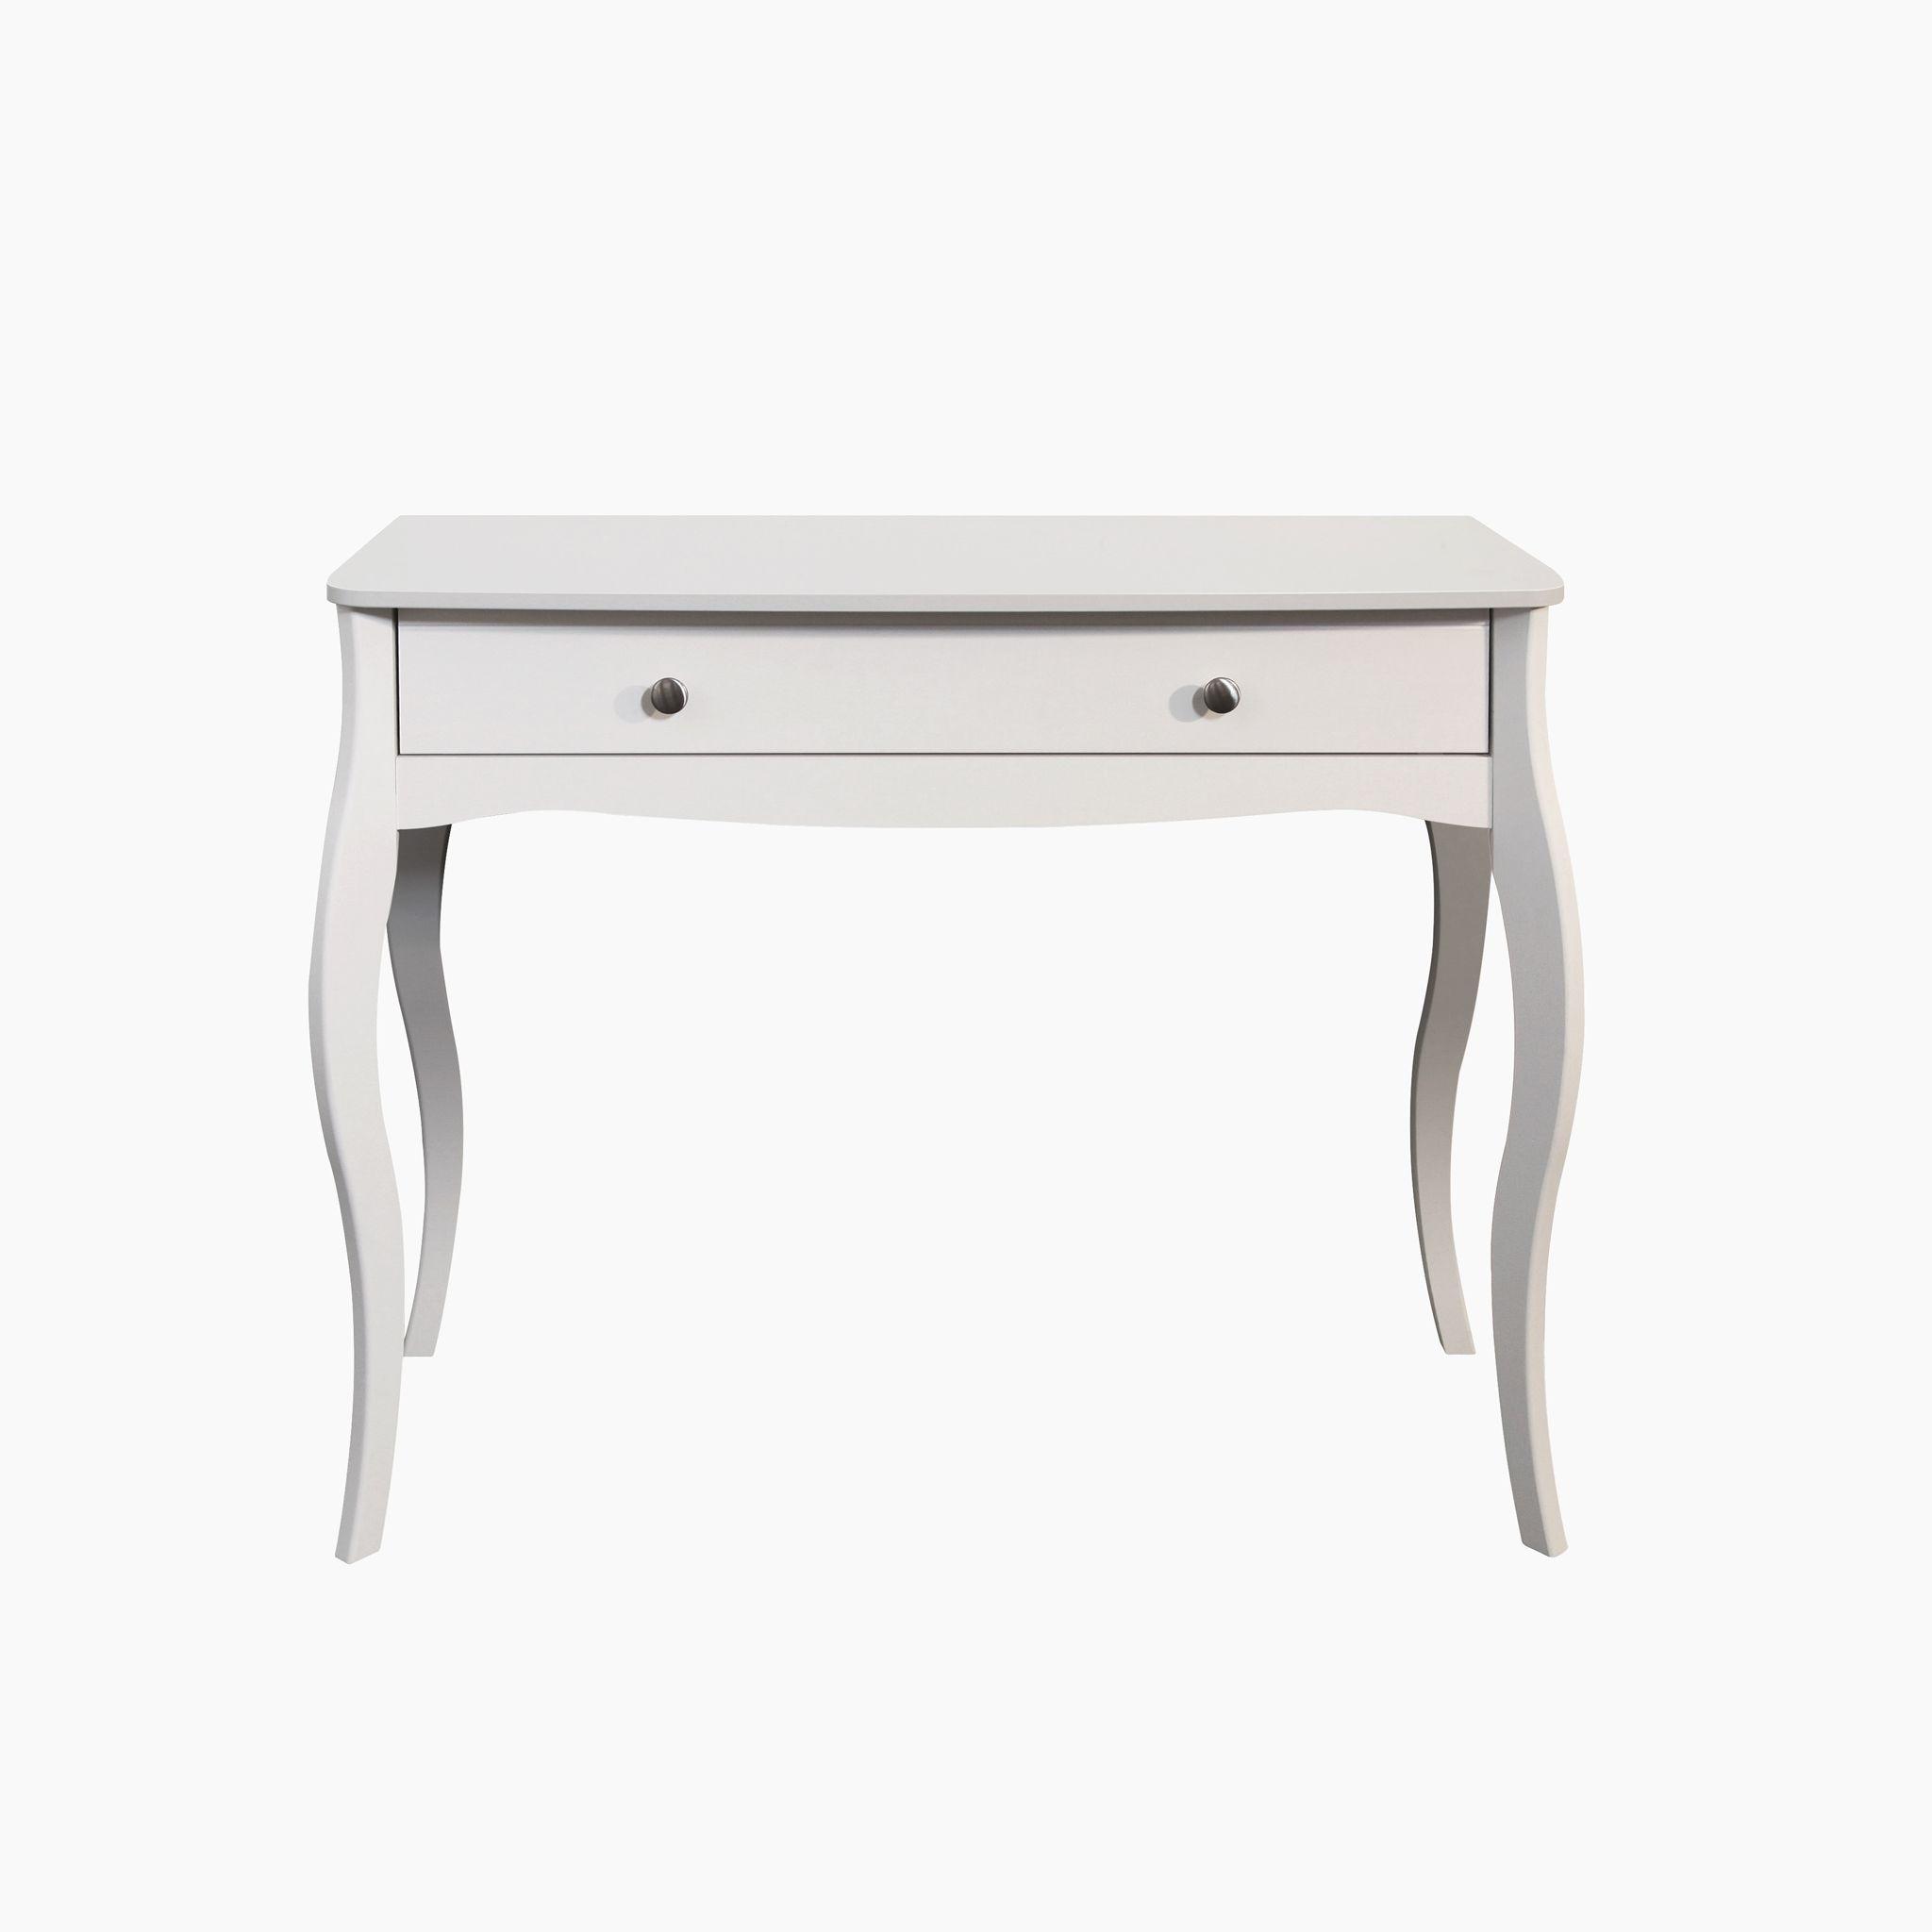 lautner white dressing table h 800mm w 1000mm. Black Bedroom Furniture Sets. Home Design Ideas